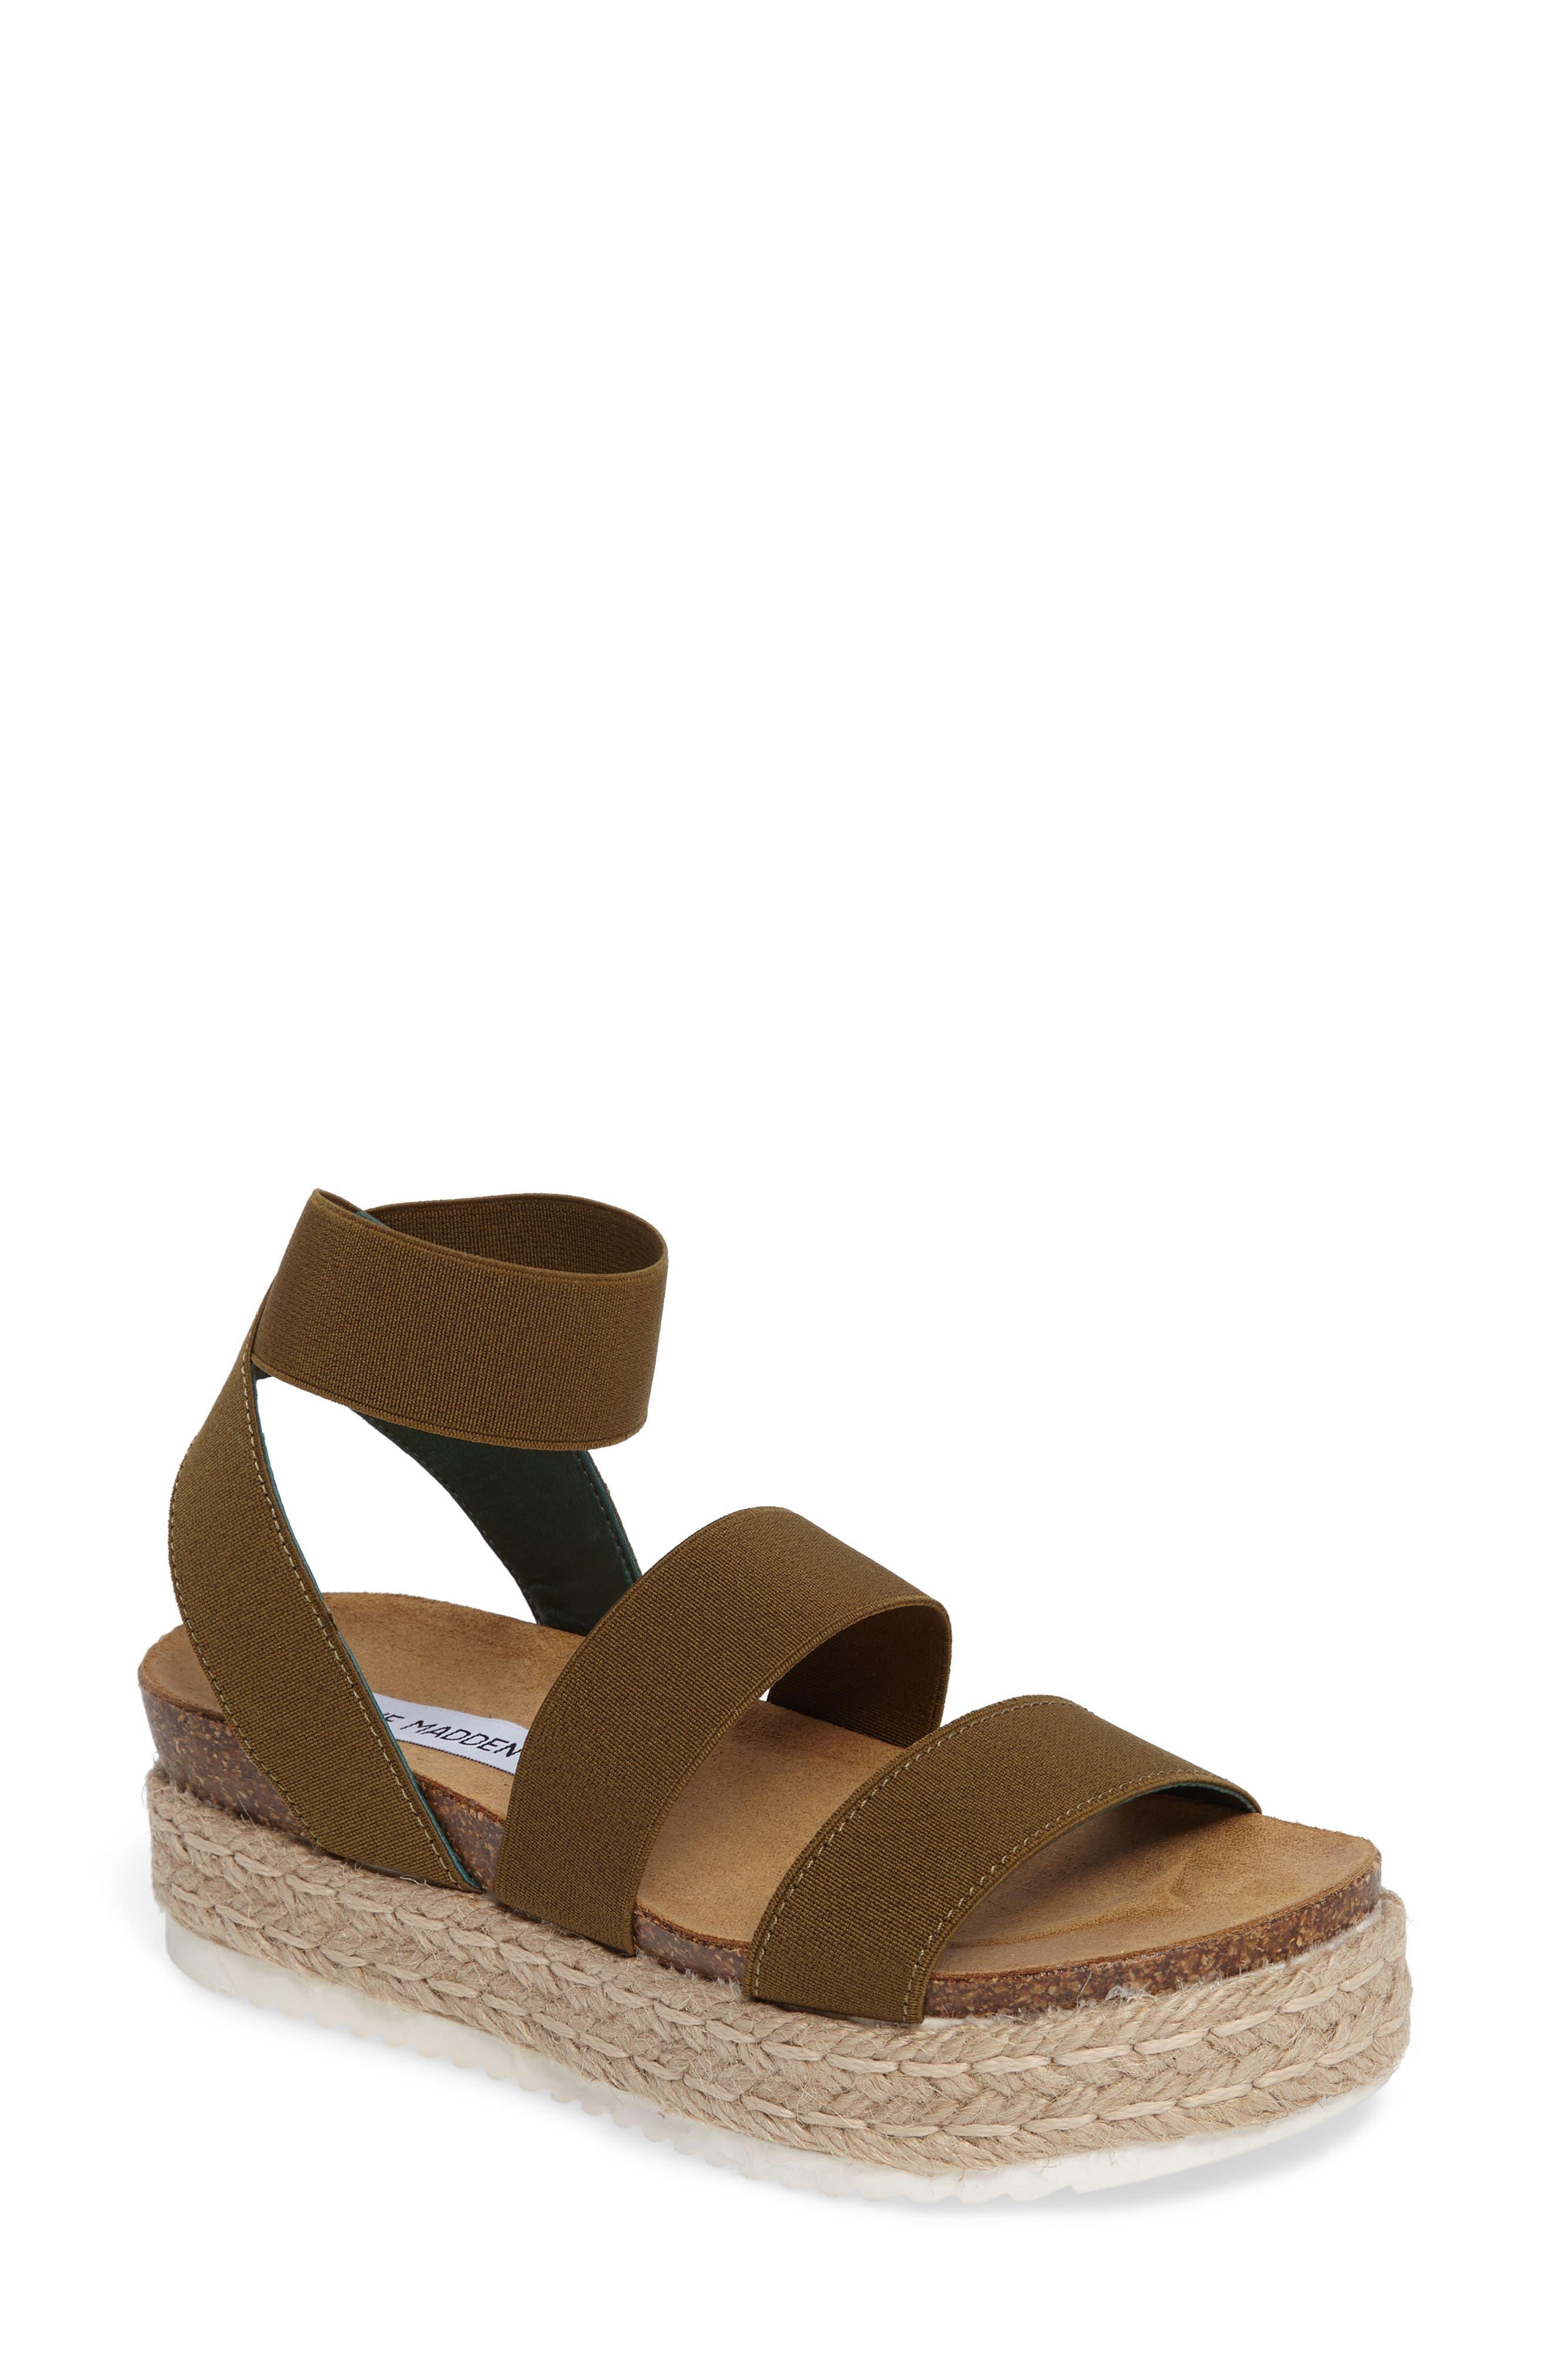 Kimmie Flatform Sandal,                             Main thumbnail 3, color,